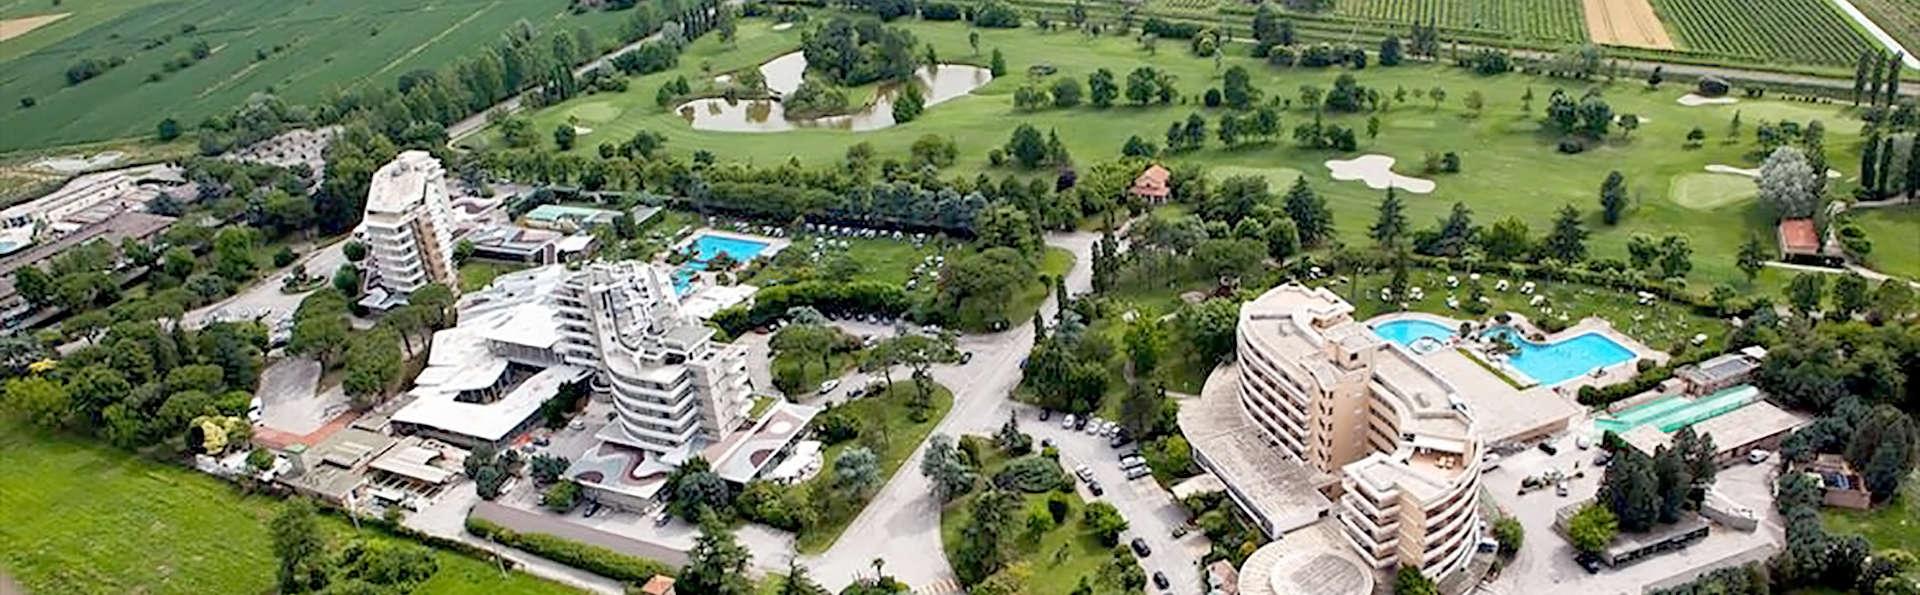 Radisson Blu Hotel Majestic - Edit_View.jpg